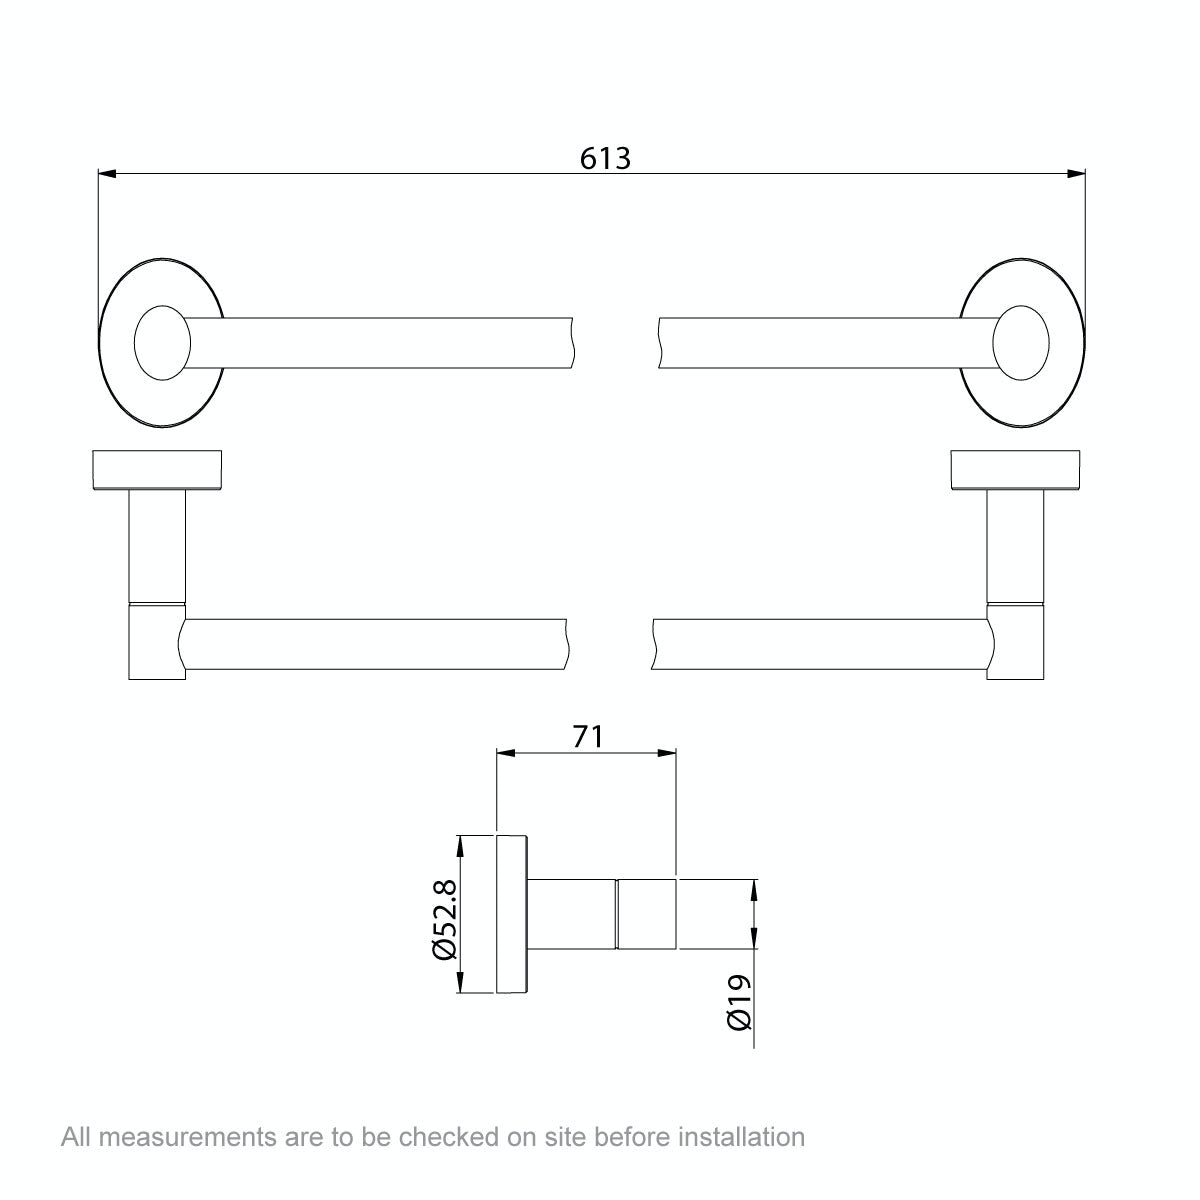 Dimensions for Orchard Lunar single towel rail